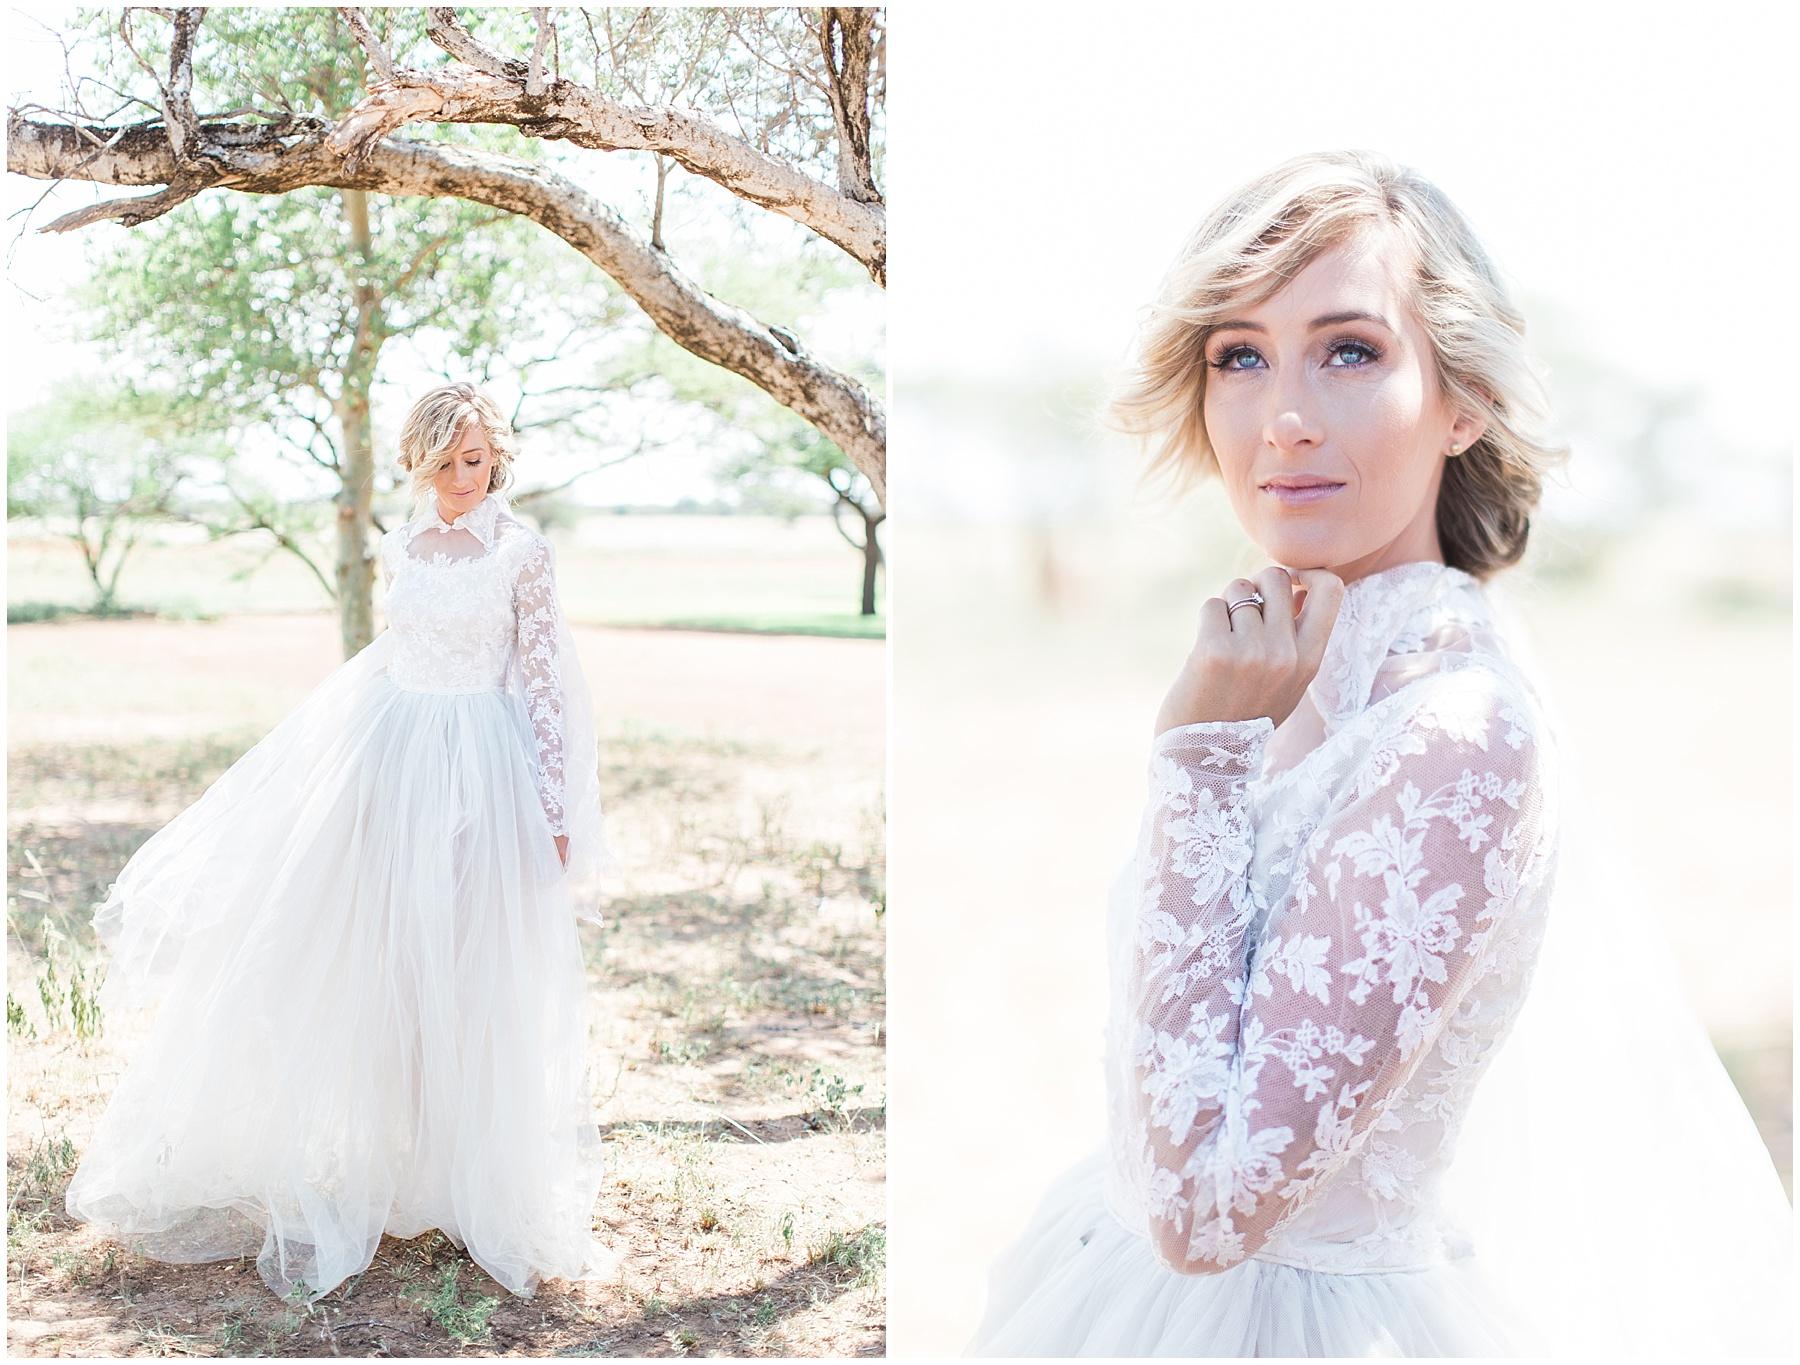 AliciaLandman_JoleneandZander_Wedding_The Pretty Blog_0435.jpg